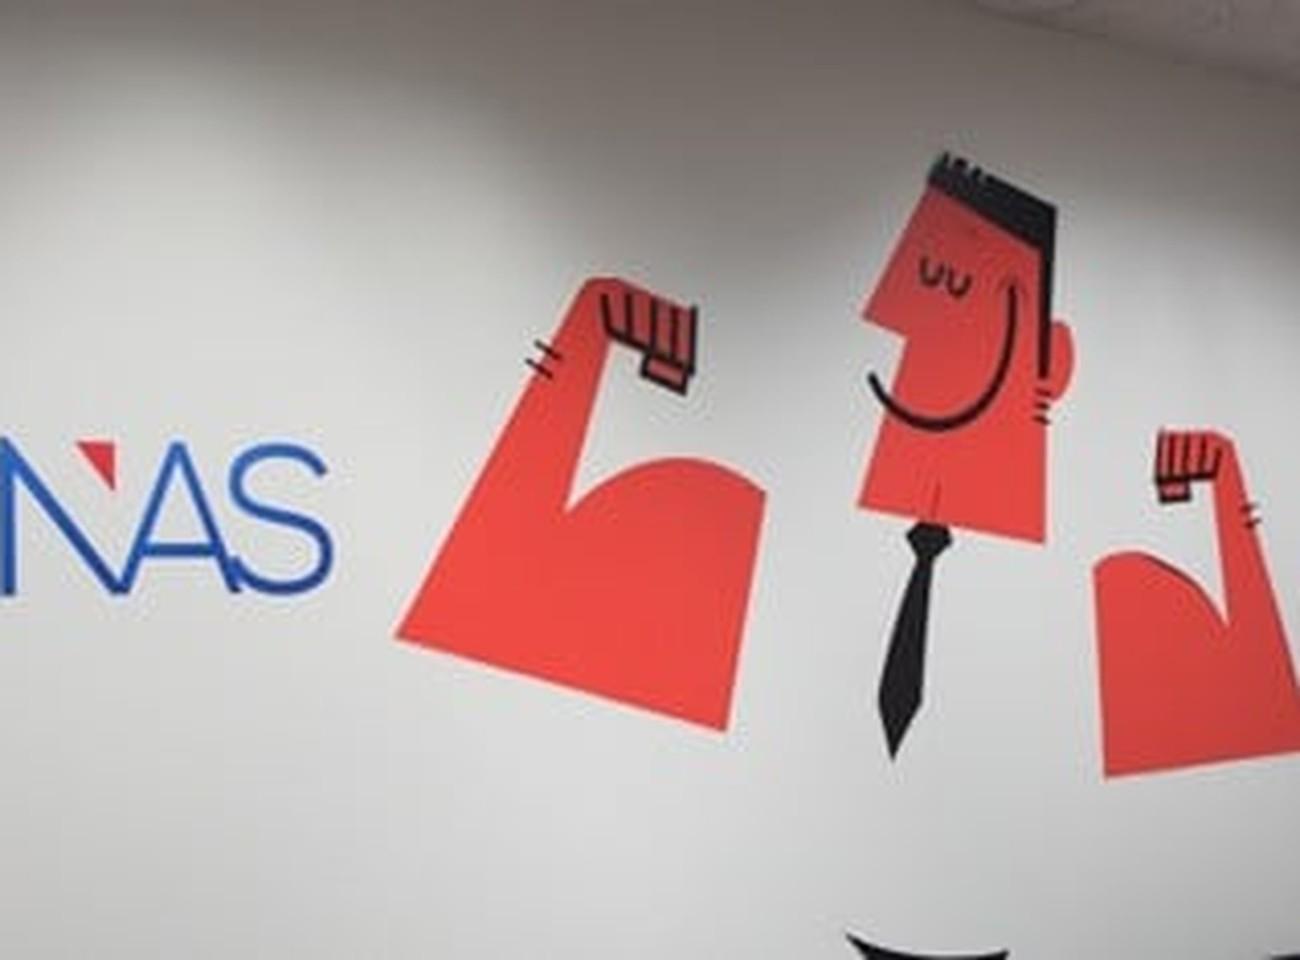 NAS Insurance Careers